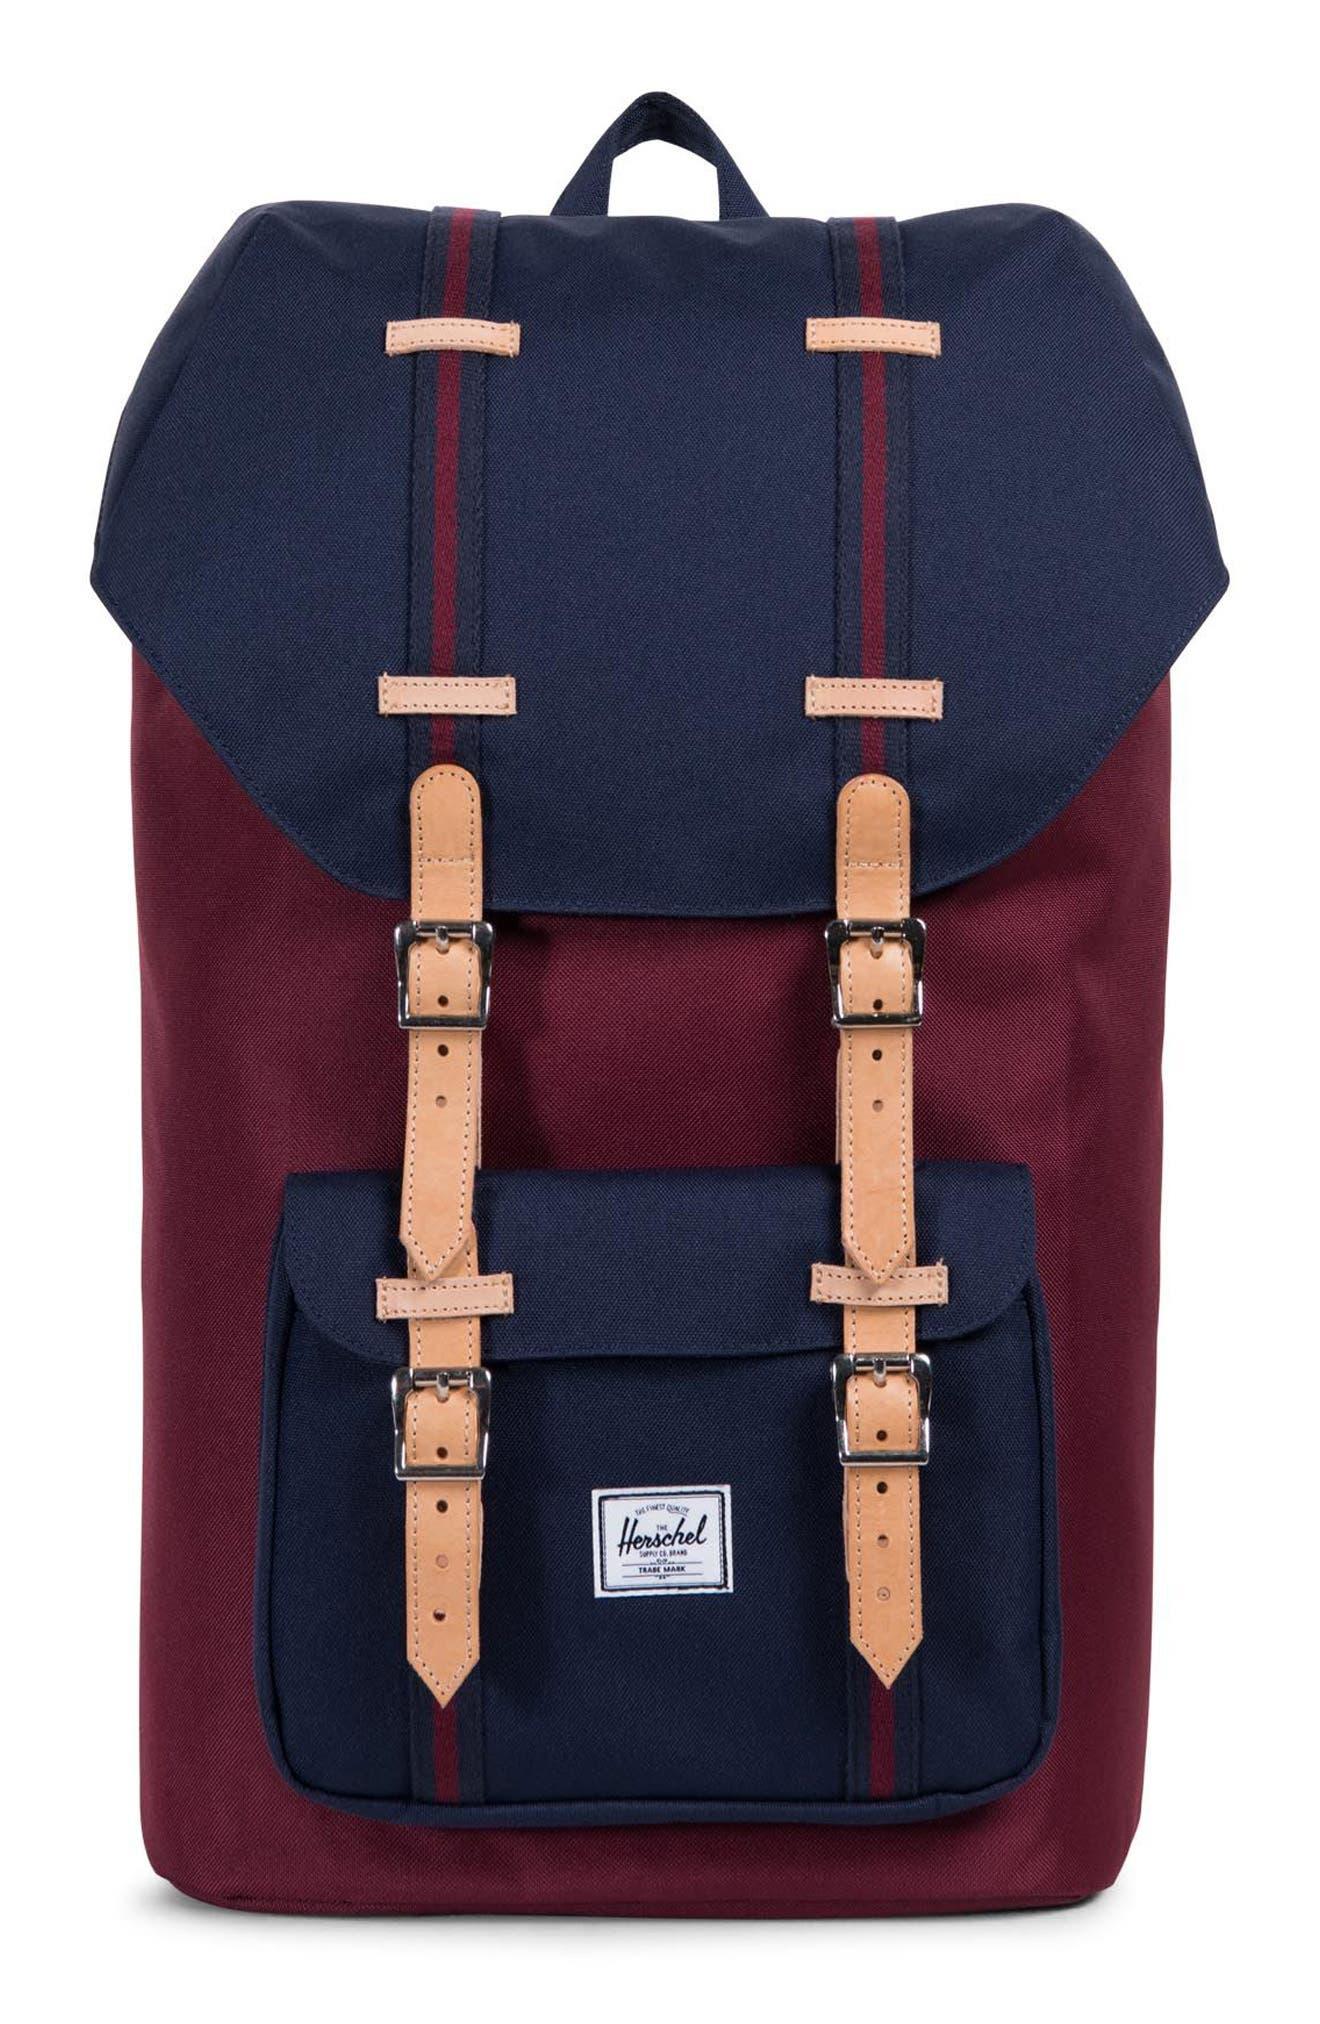 Little America Backpack,                         Main,                         color, Windsor Wine/